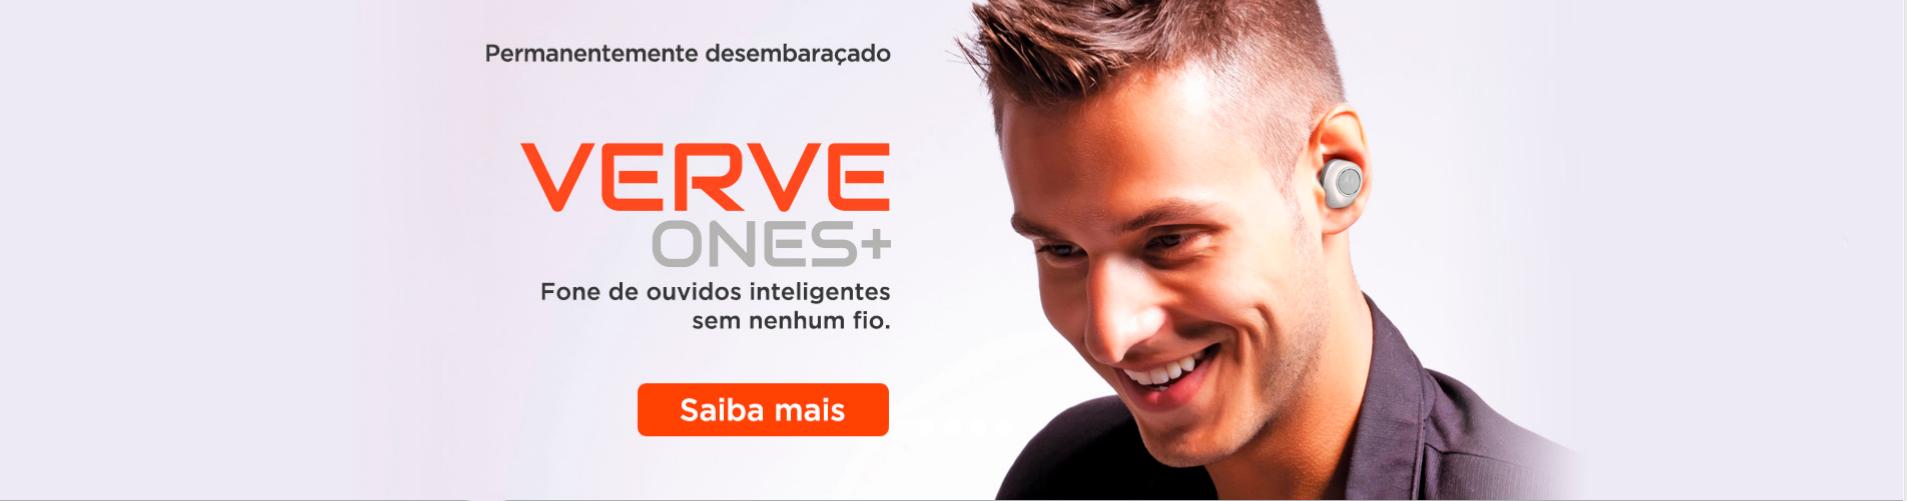 banner verveone